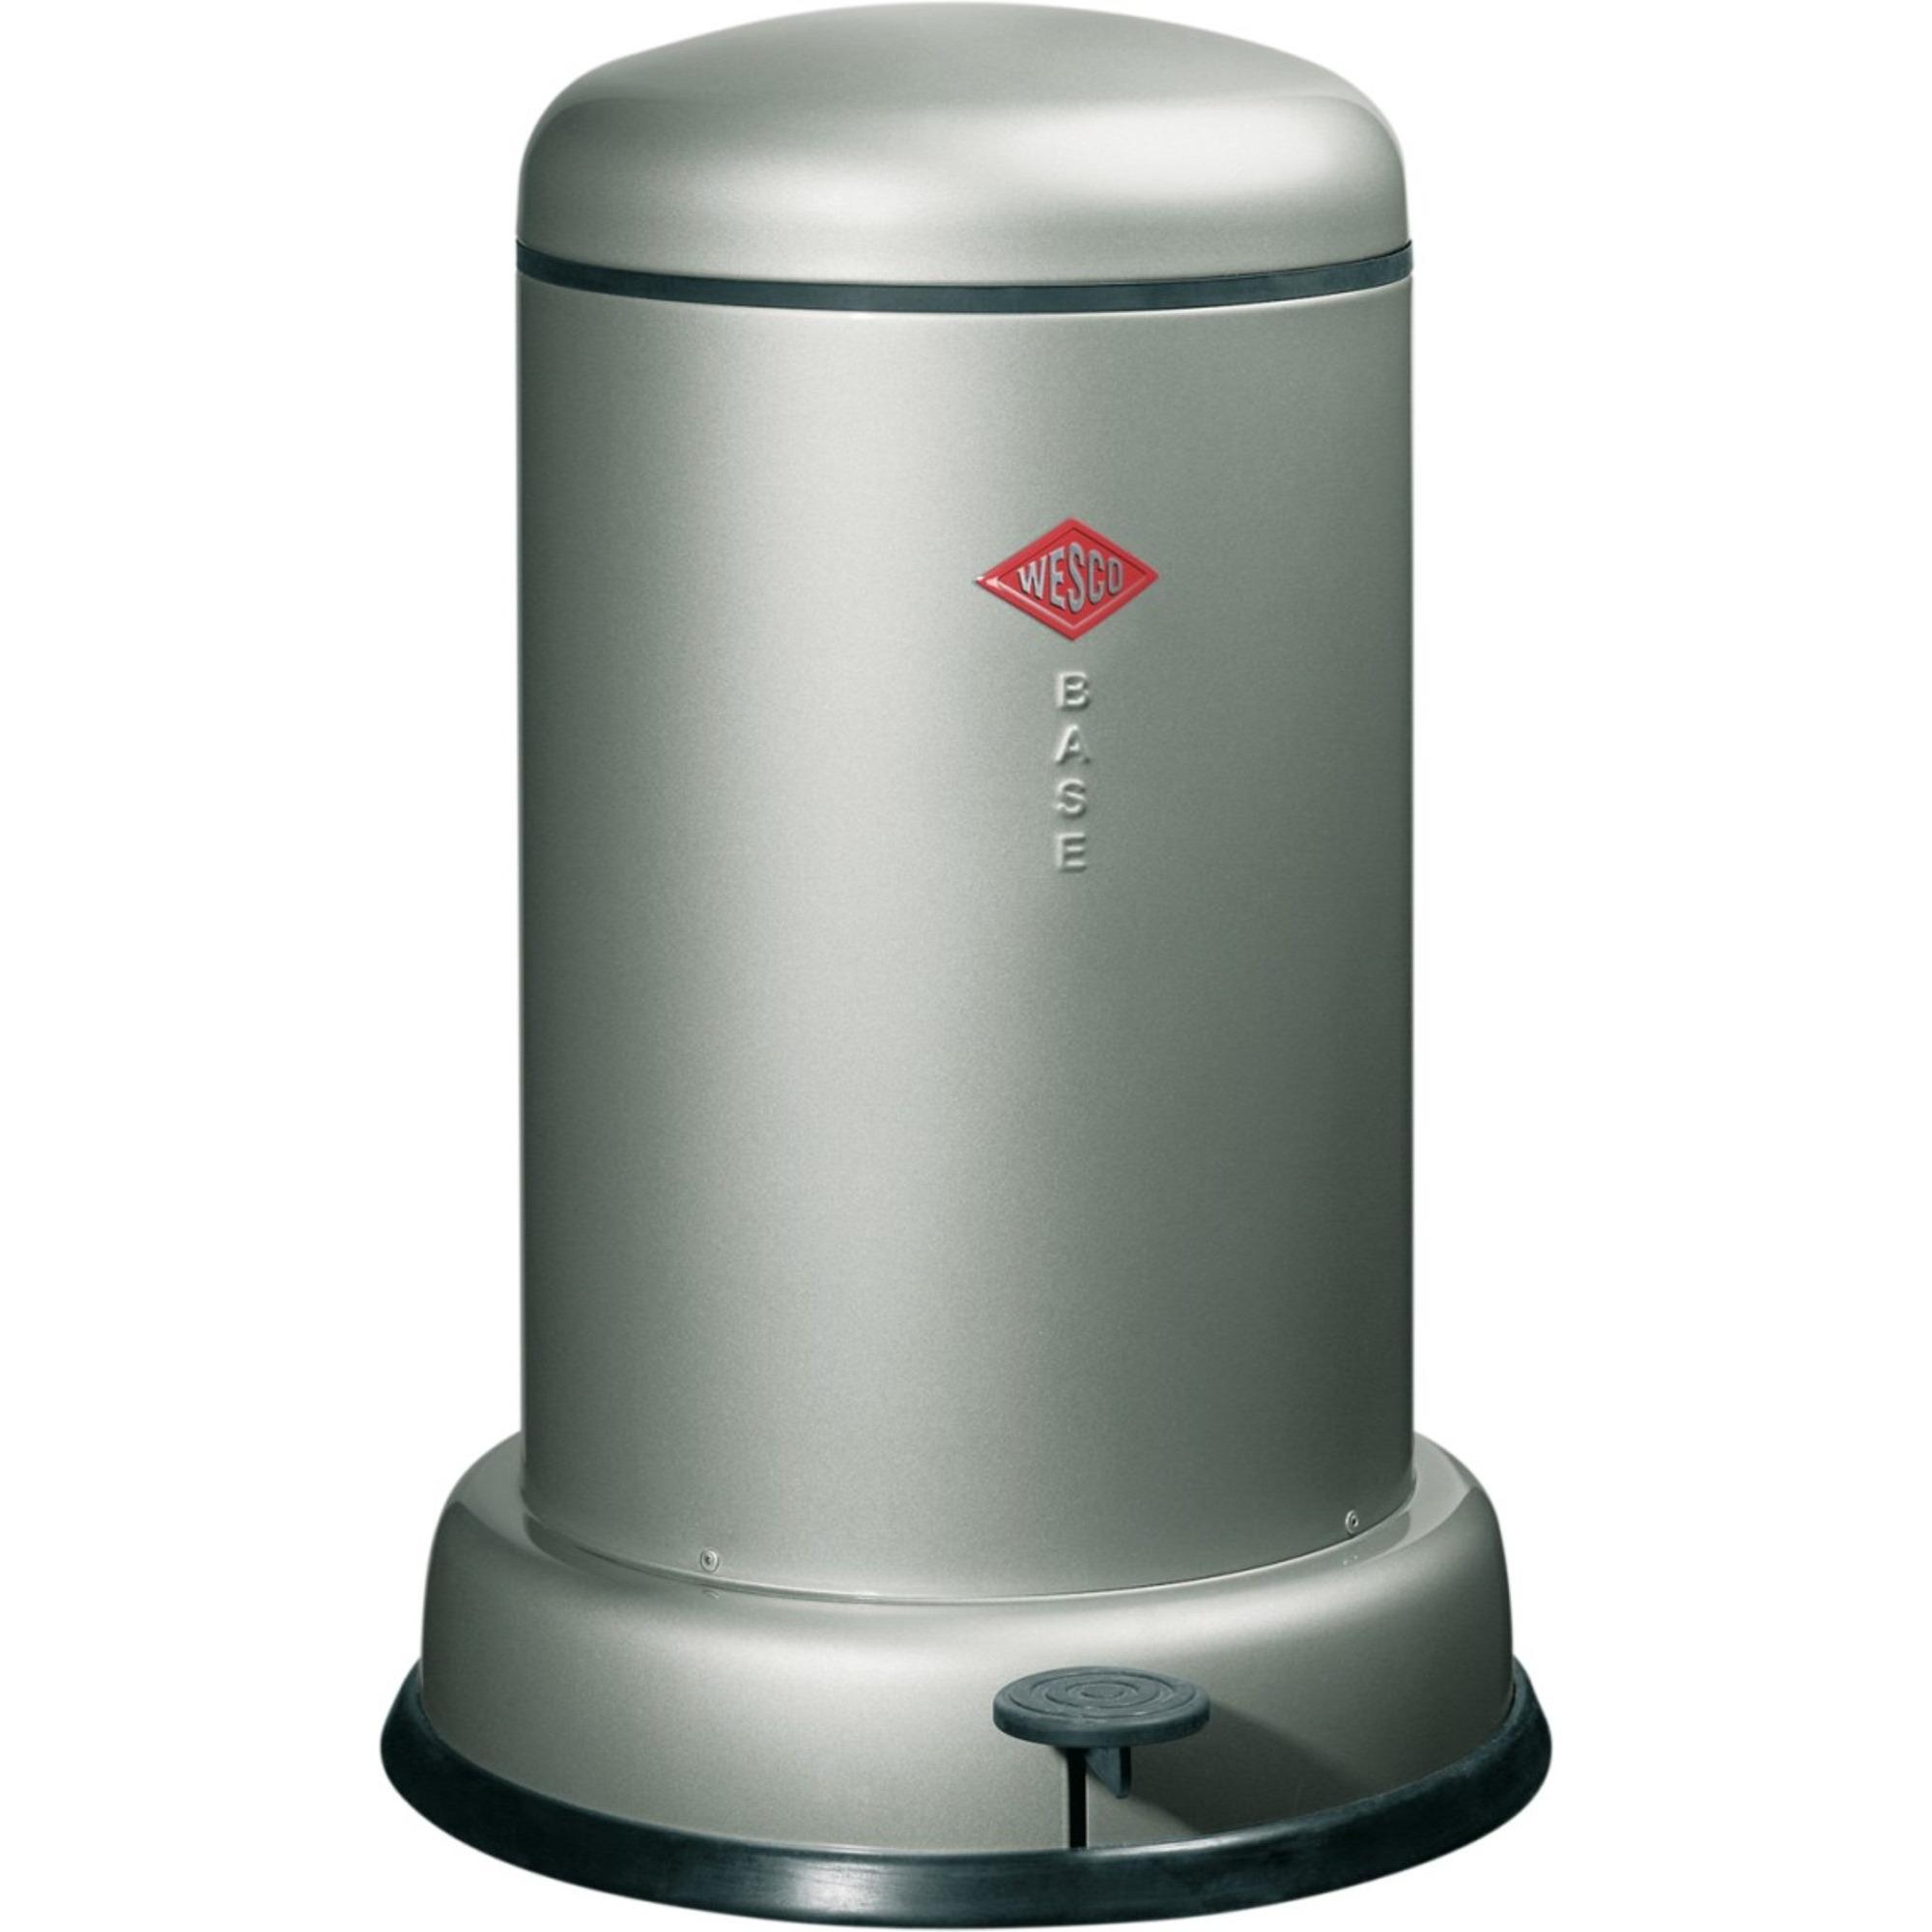 Wesco 15 liter Baseboy Ljusgrå